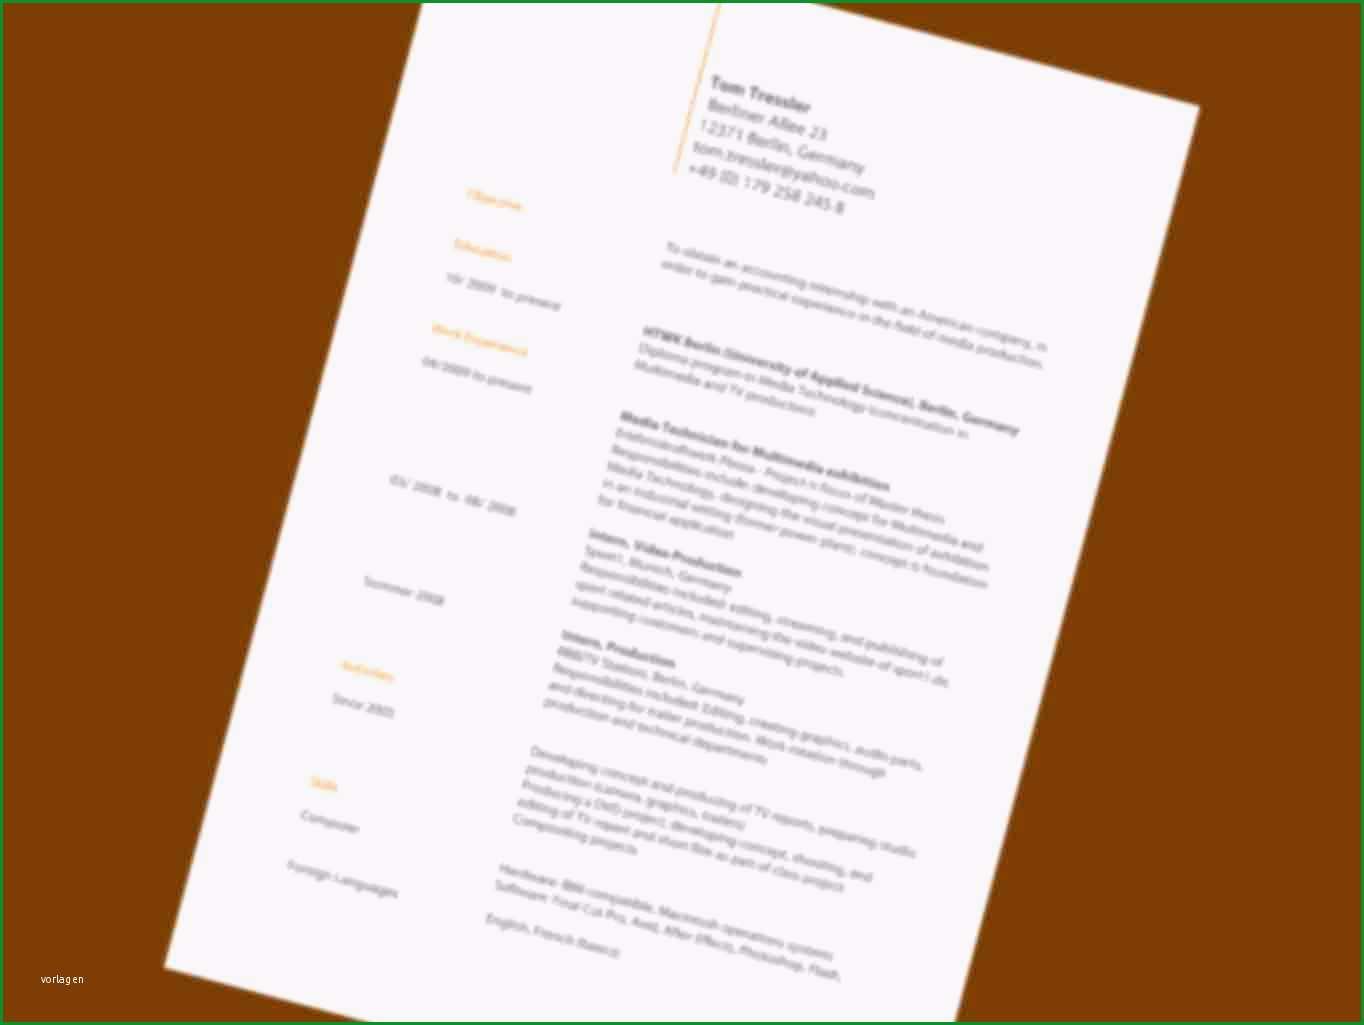 coverletter example cv englisch muster